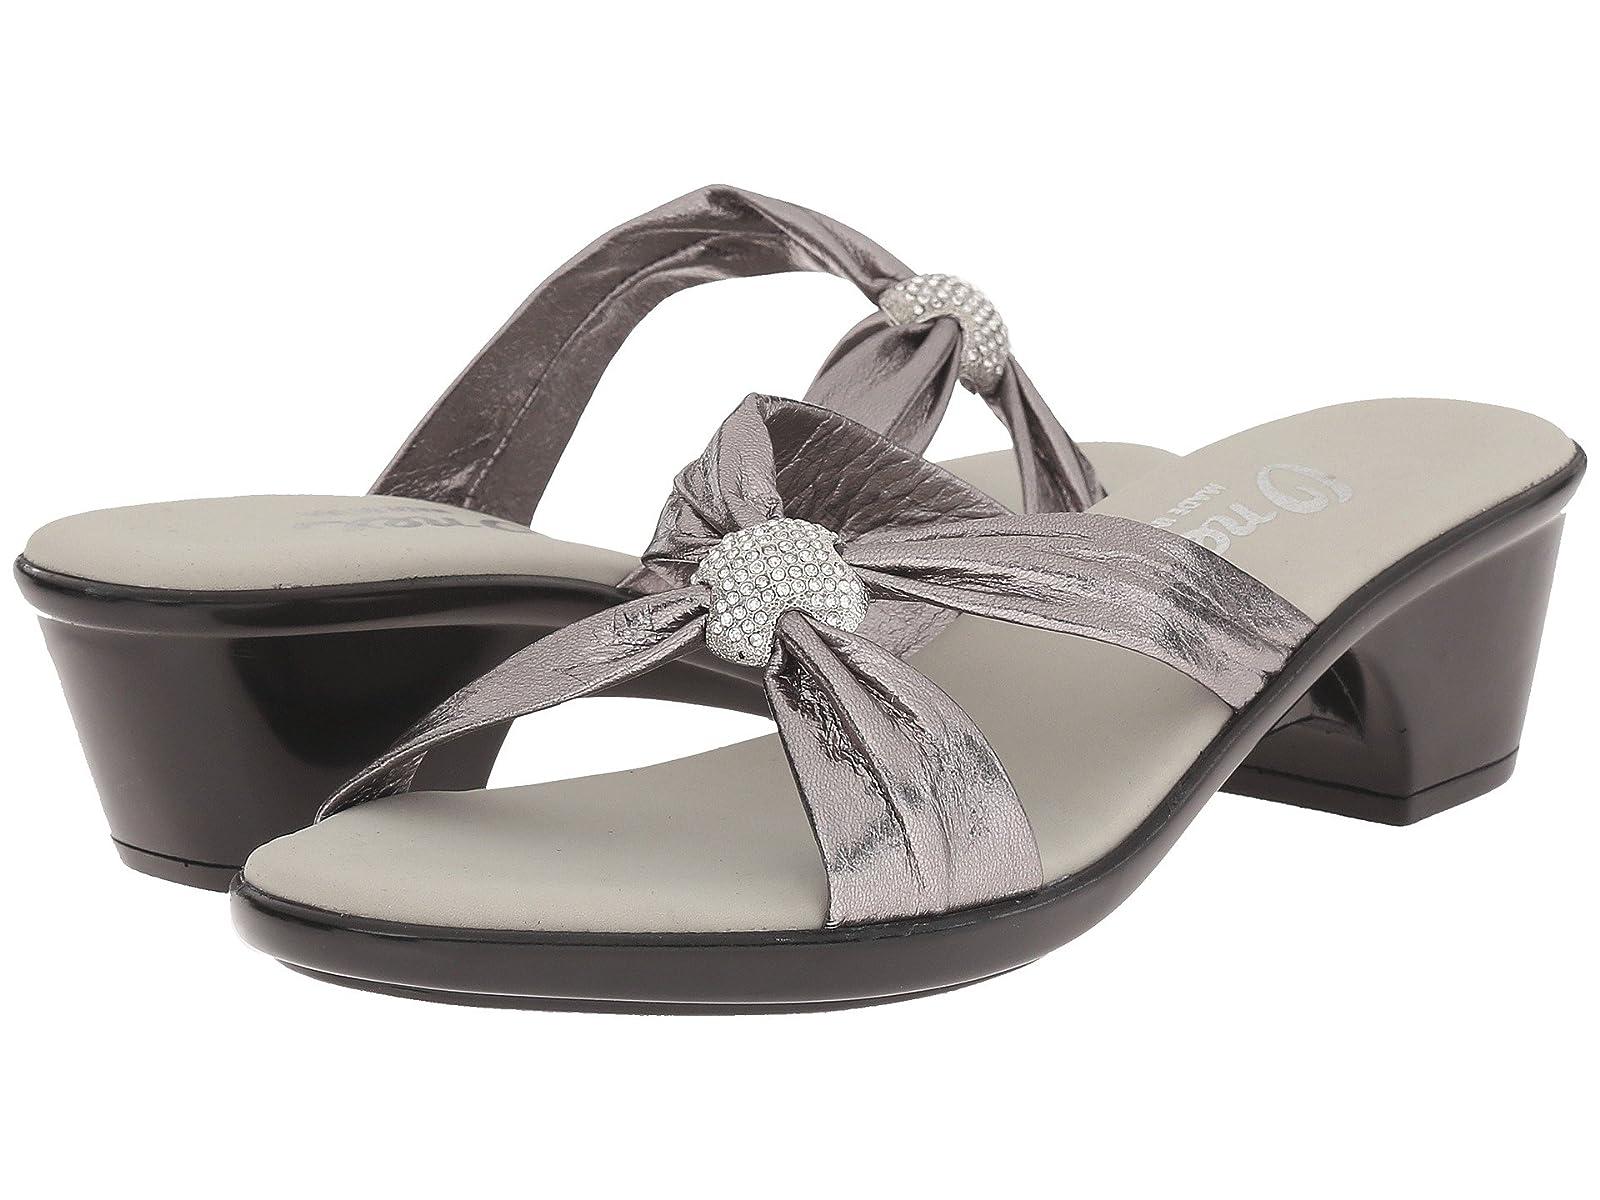 Onex JenaCheap and distinctive eye-catching shoes